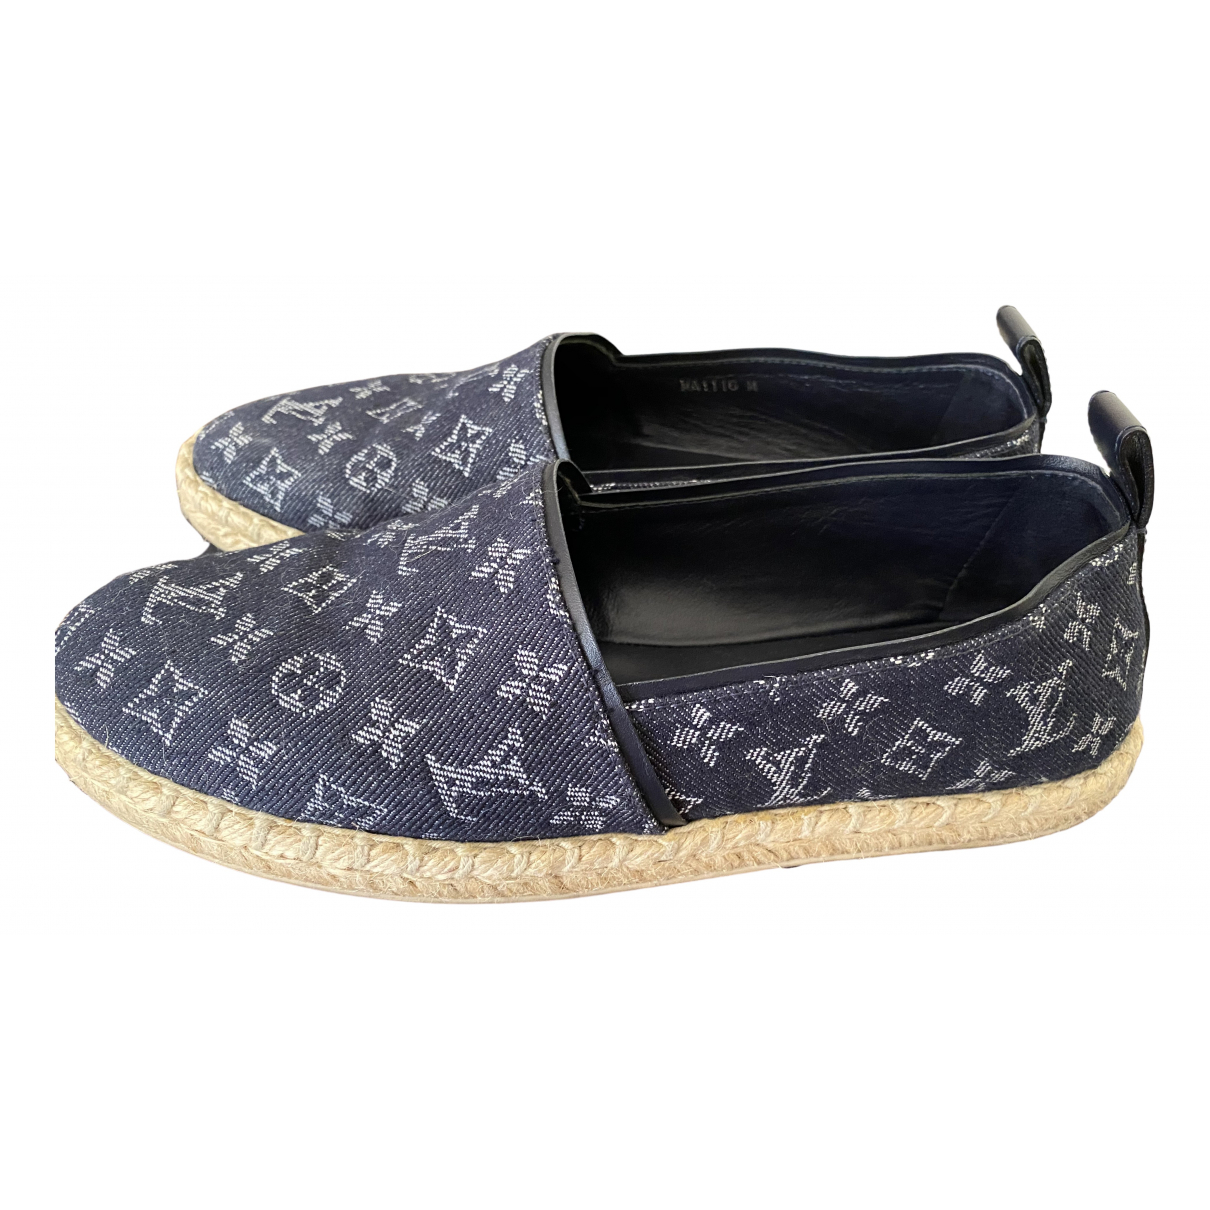 Louis Vuitton \N Espadrilles in  Blau Denim - Jeans